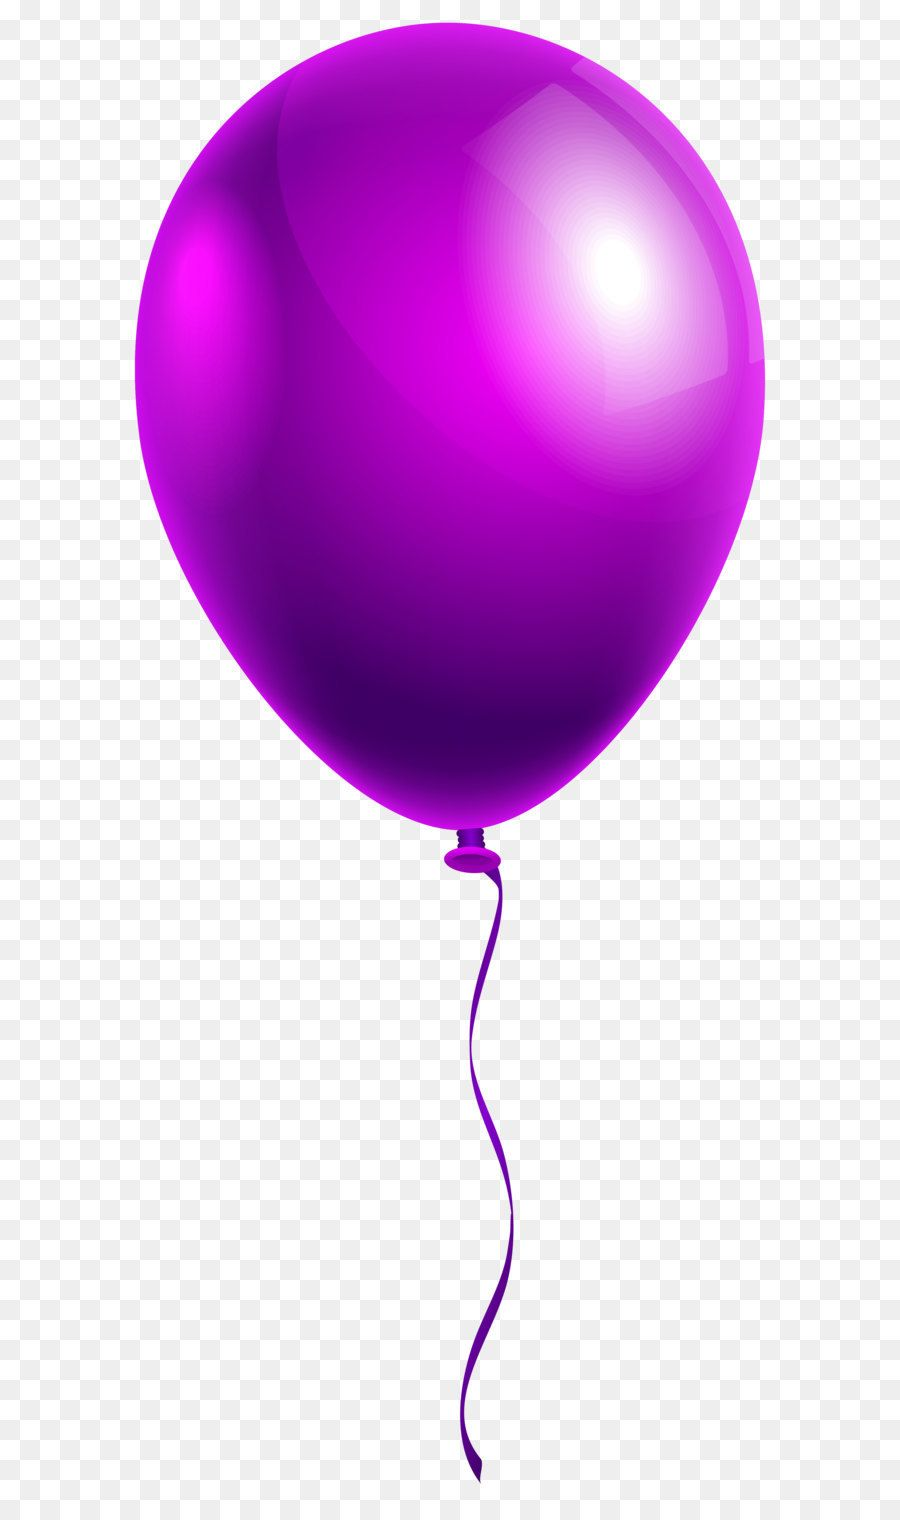 Balloon Clip Art Single Purple Balloon Png Clipart Image